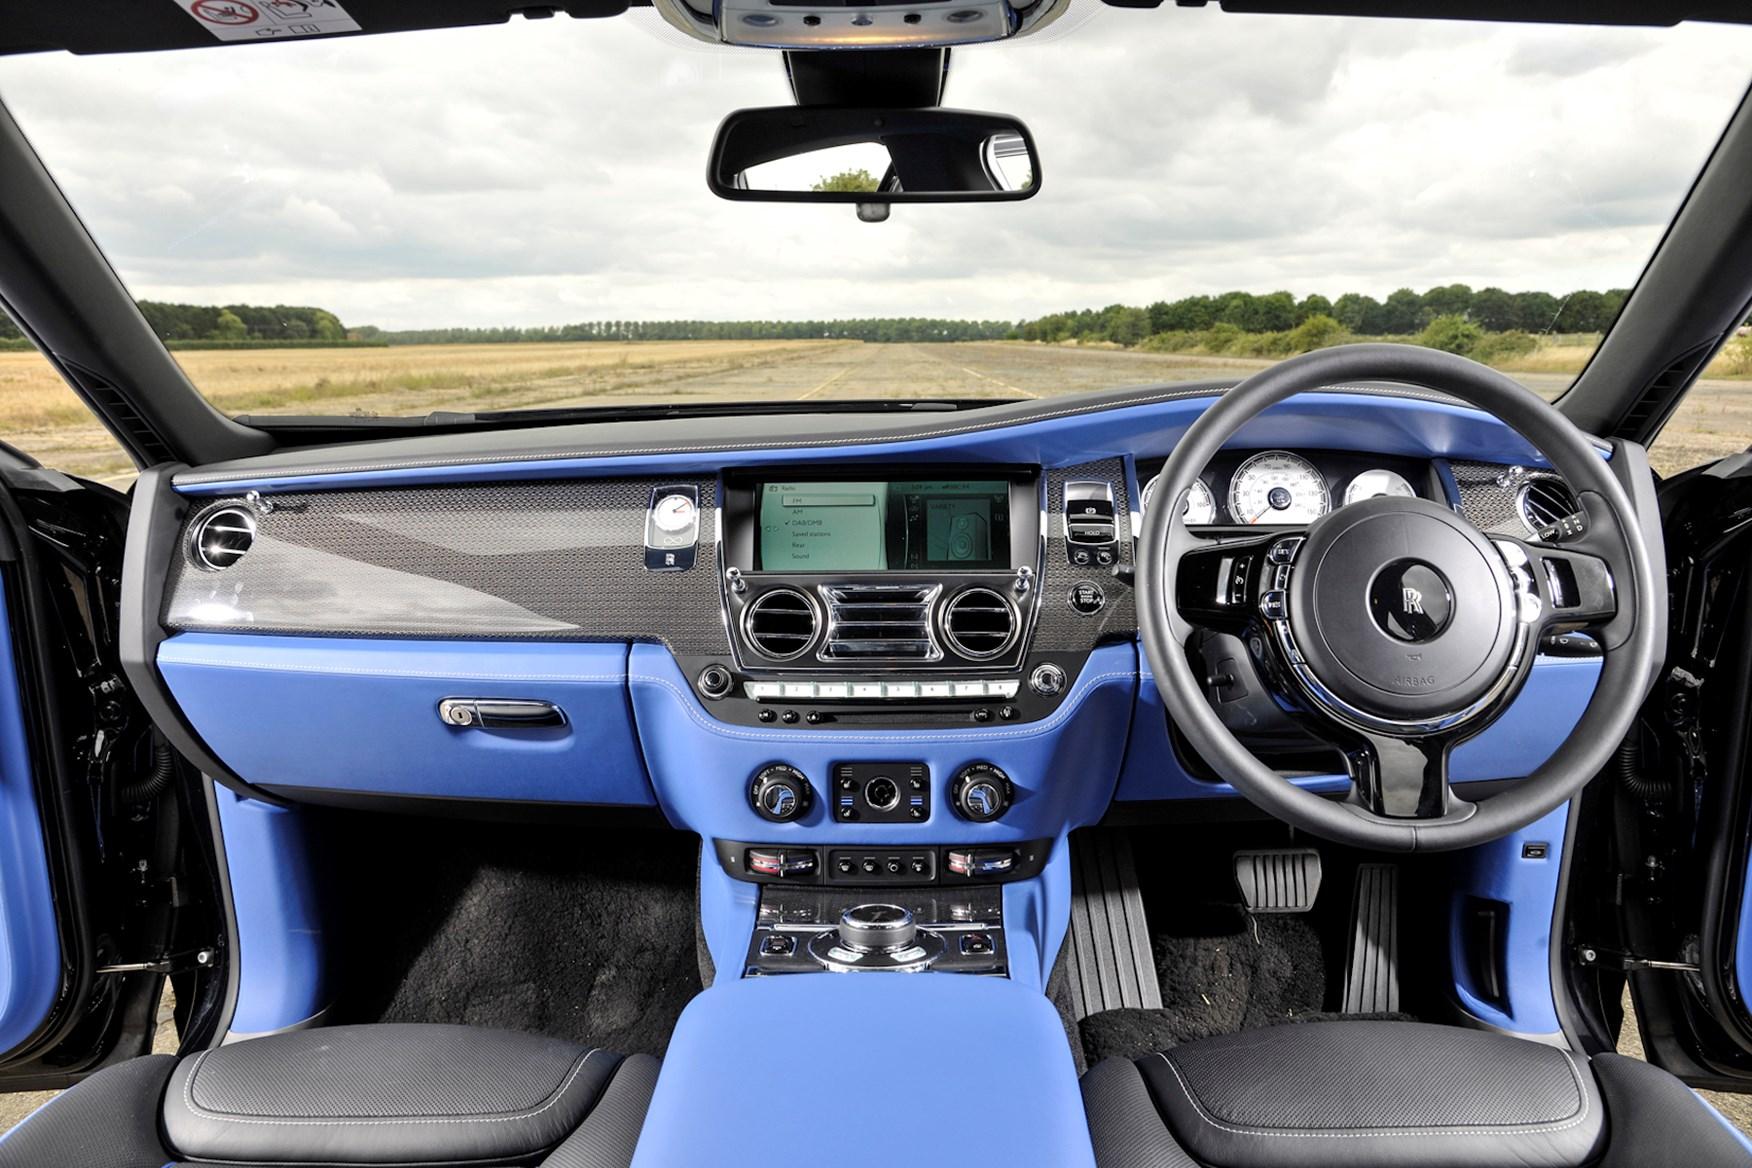 Twin test: Bentley Flying Spur vs Rolls-Royce Ghost | Parkers